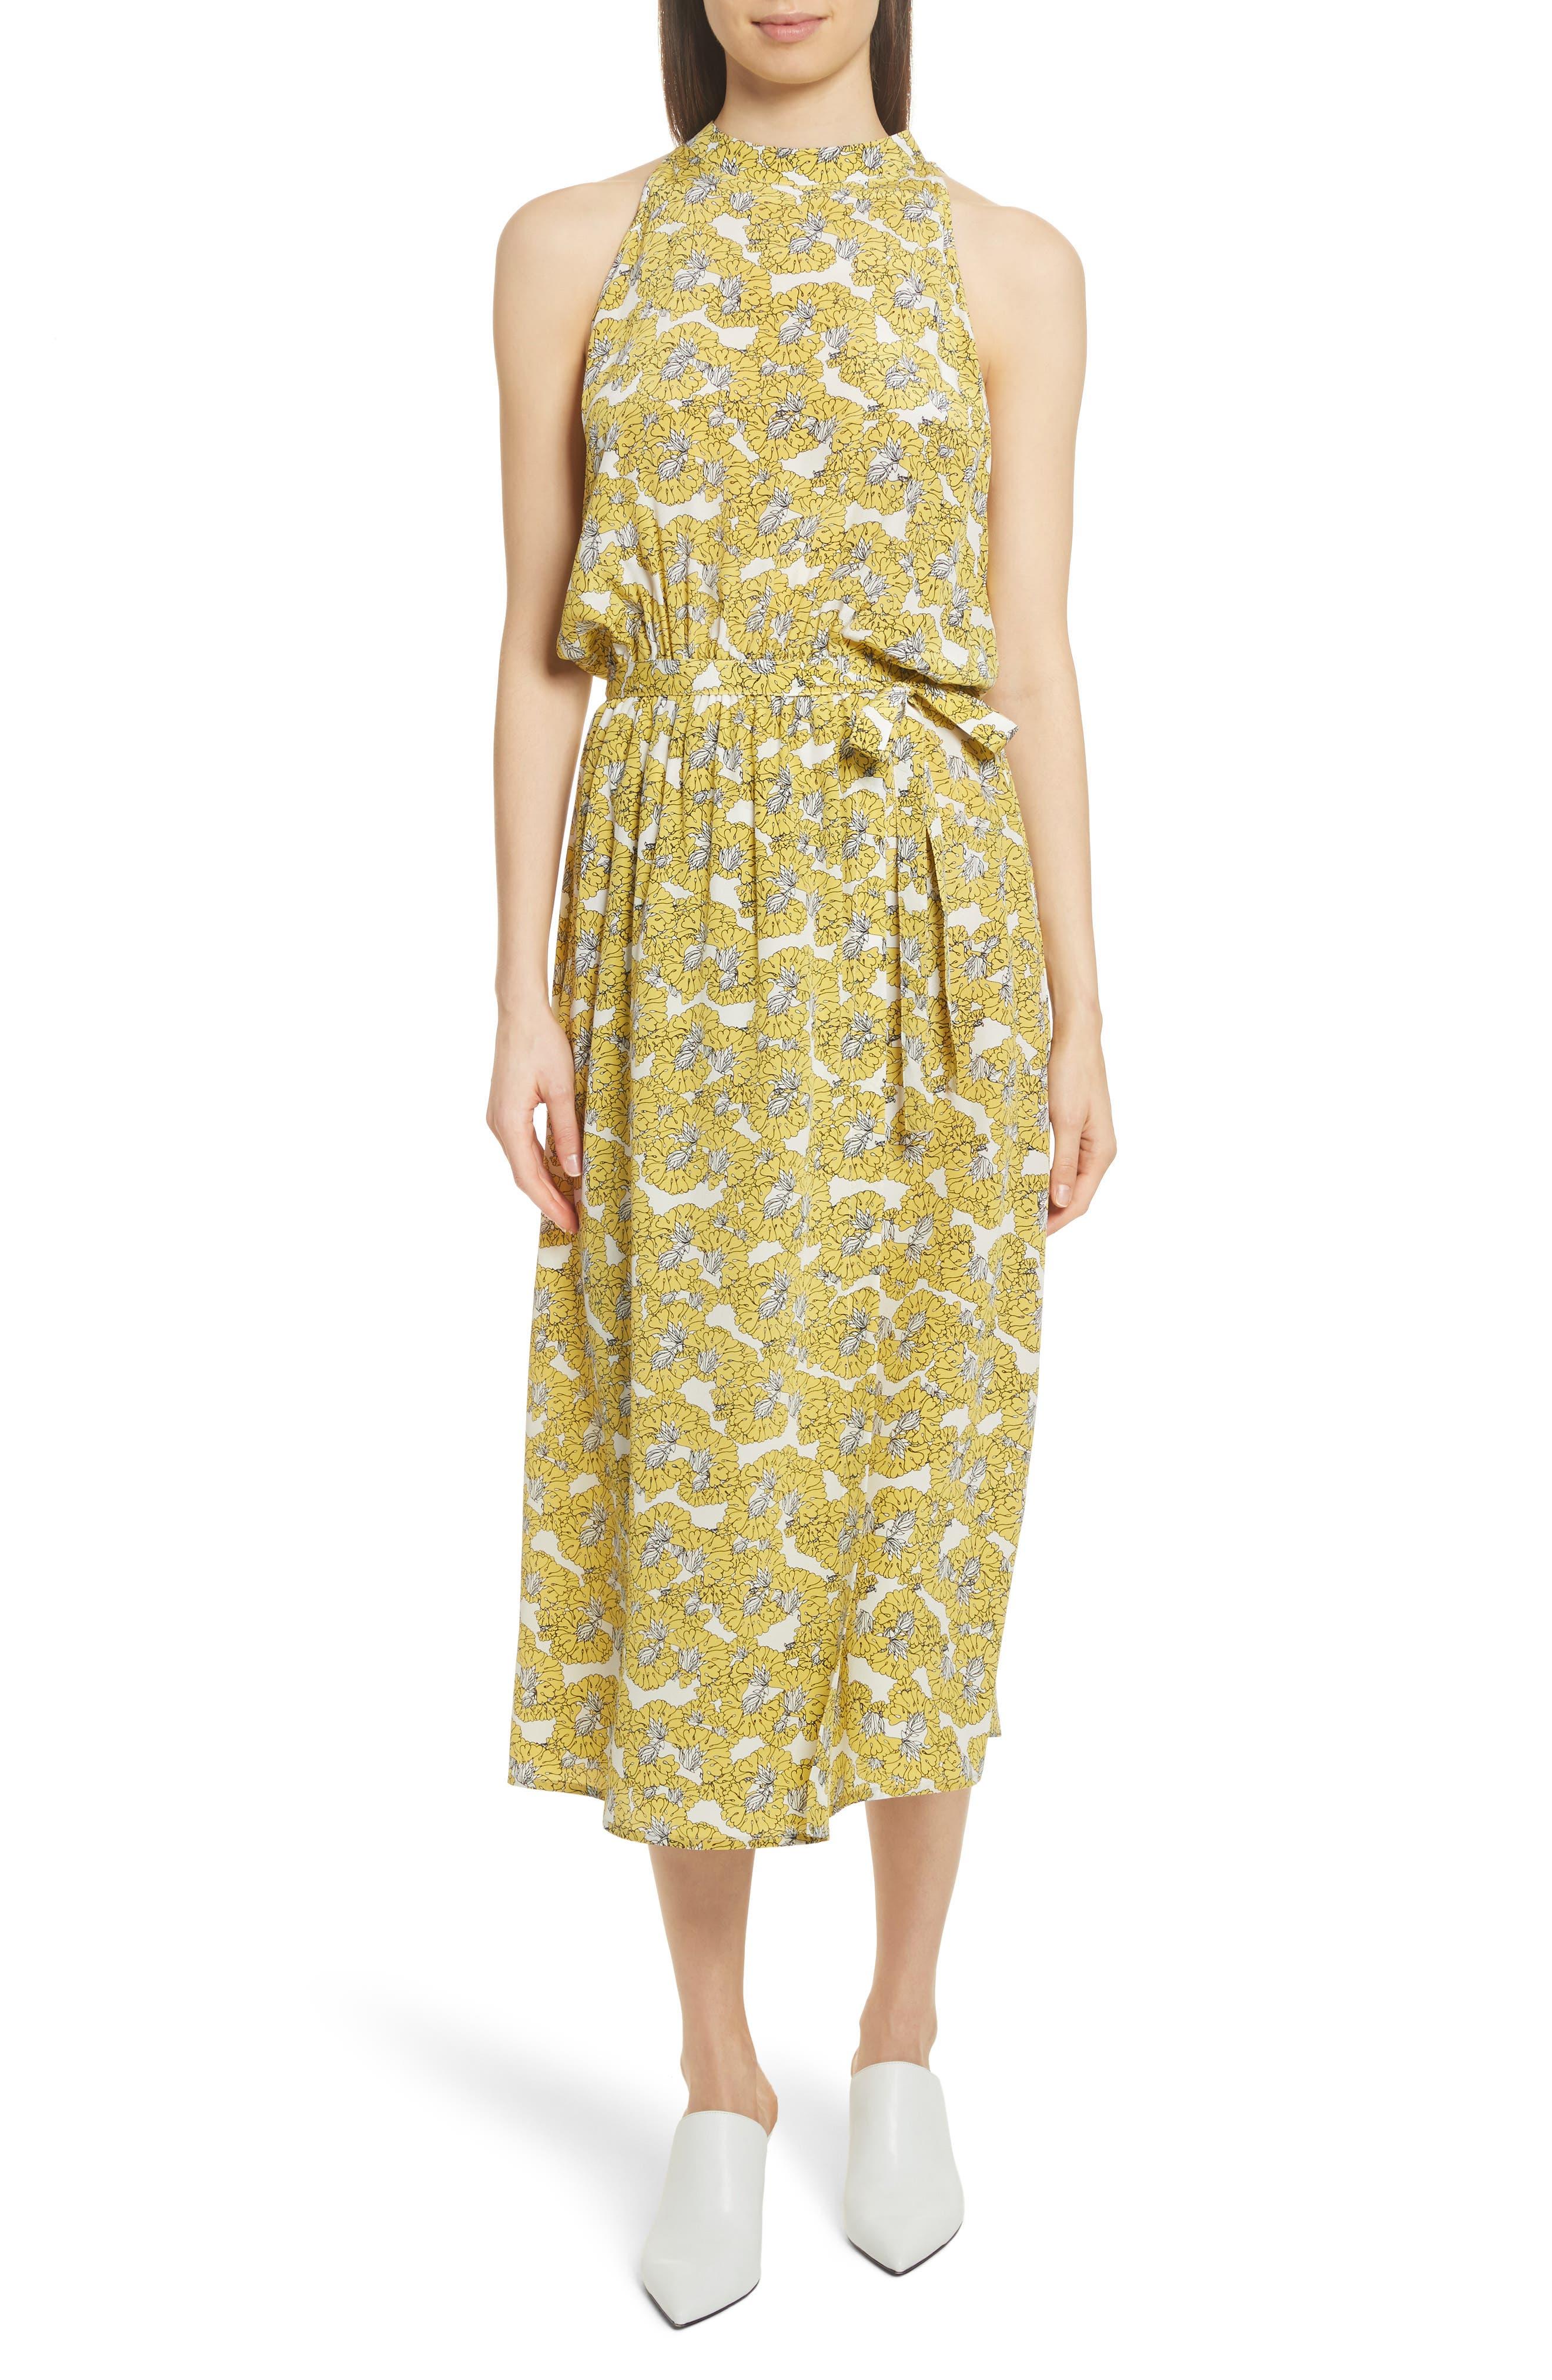 Dania Floral Print Dress,                             Main thumbnail 1, color,                             730